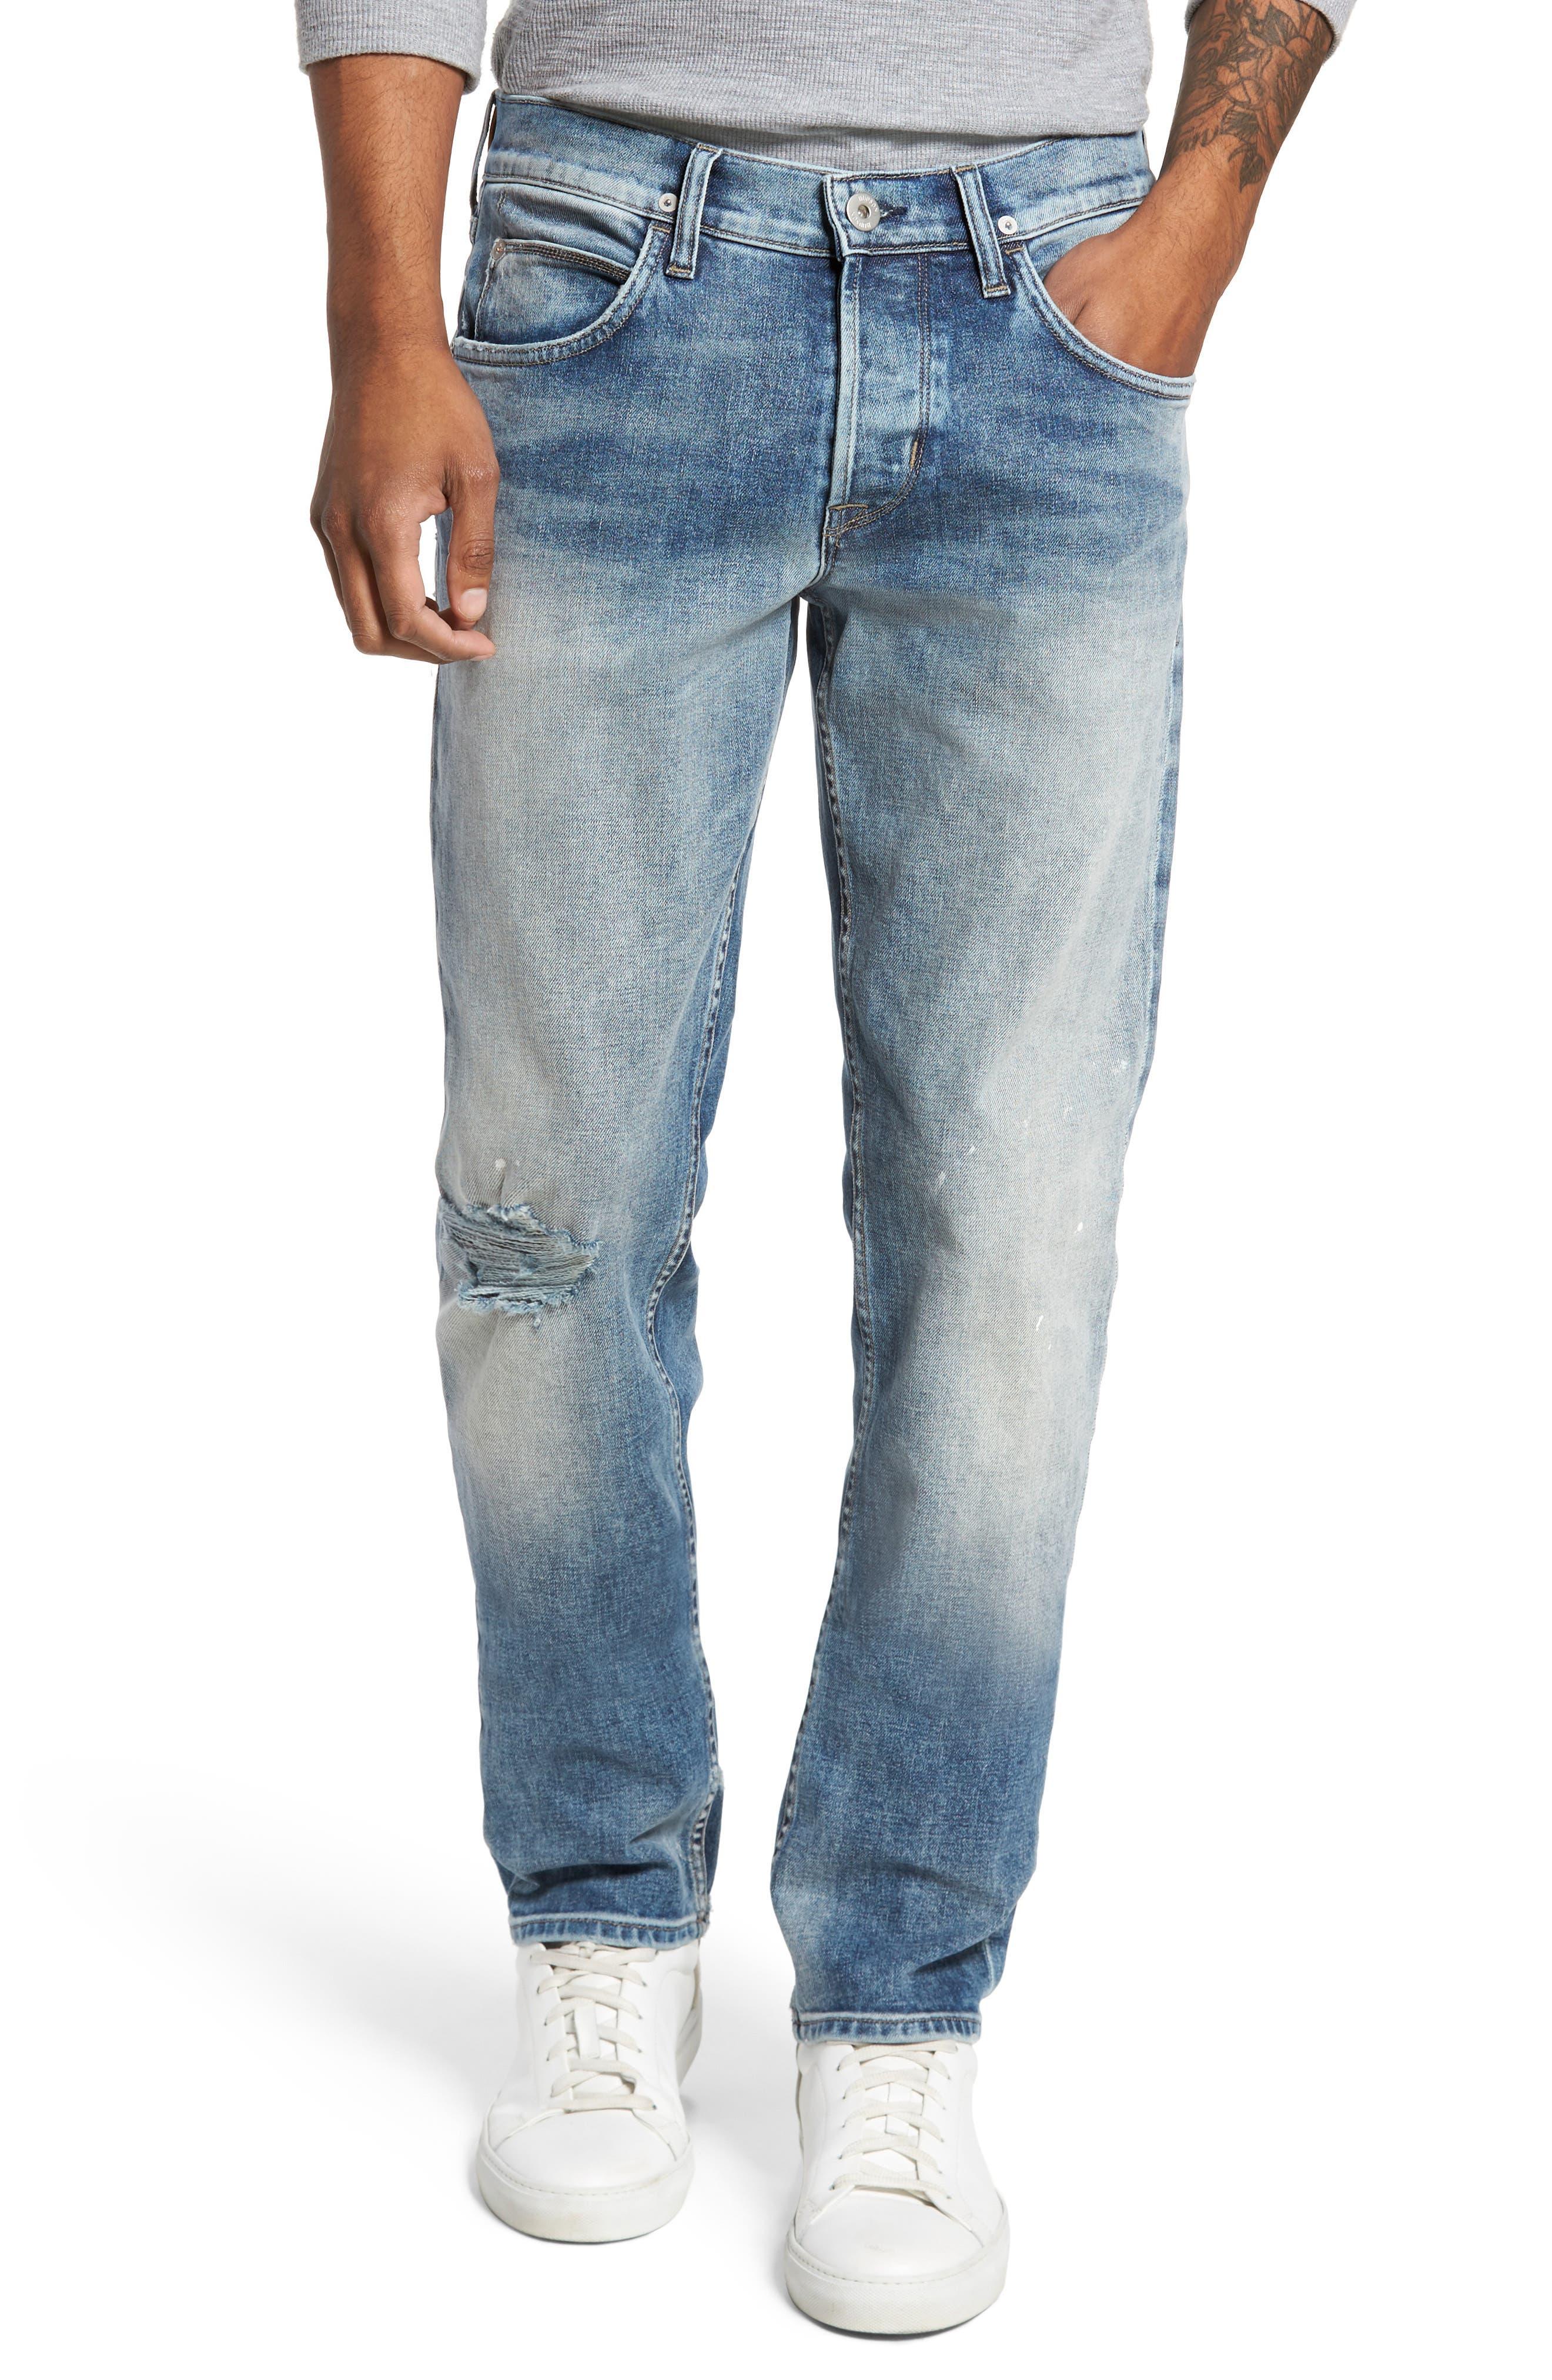 Blake Slim Fit Jeans,                             Main thumbnail 1, color,                             451